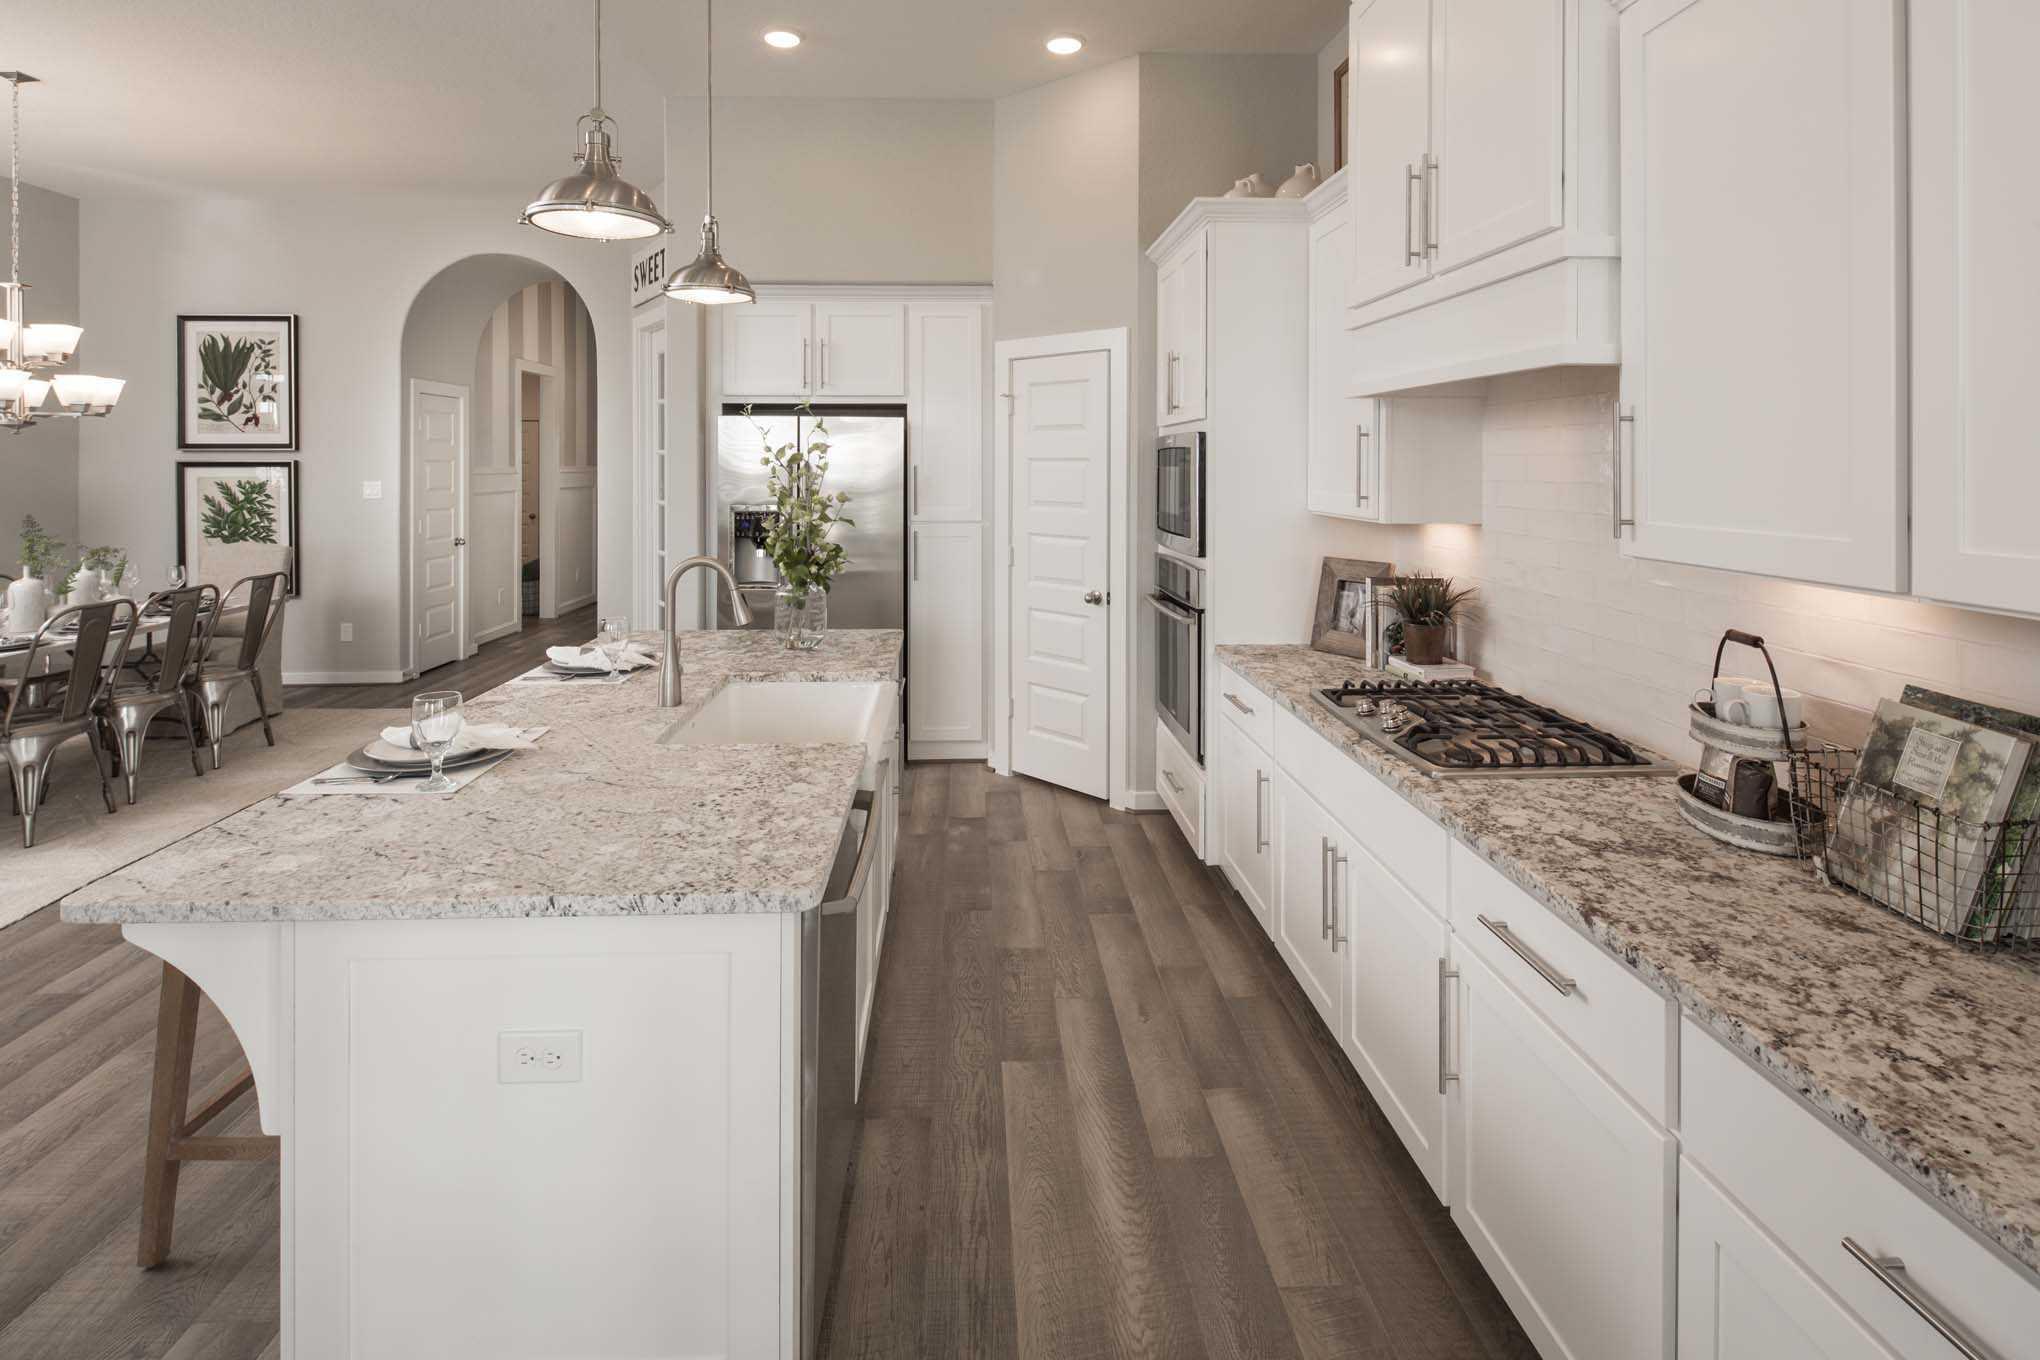 Kitchen-in-Plan 539-at-Ventana: 55ft. lots-in-Bulverde